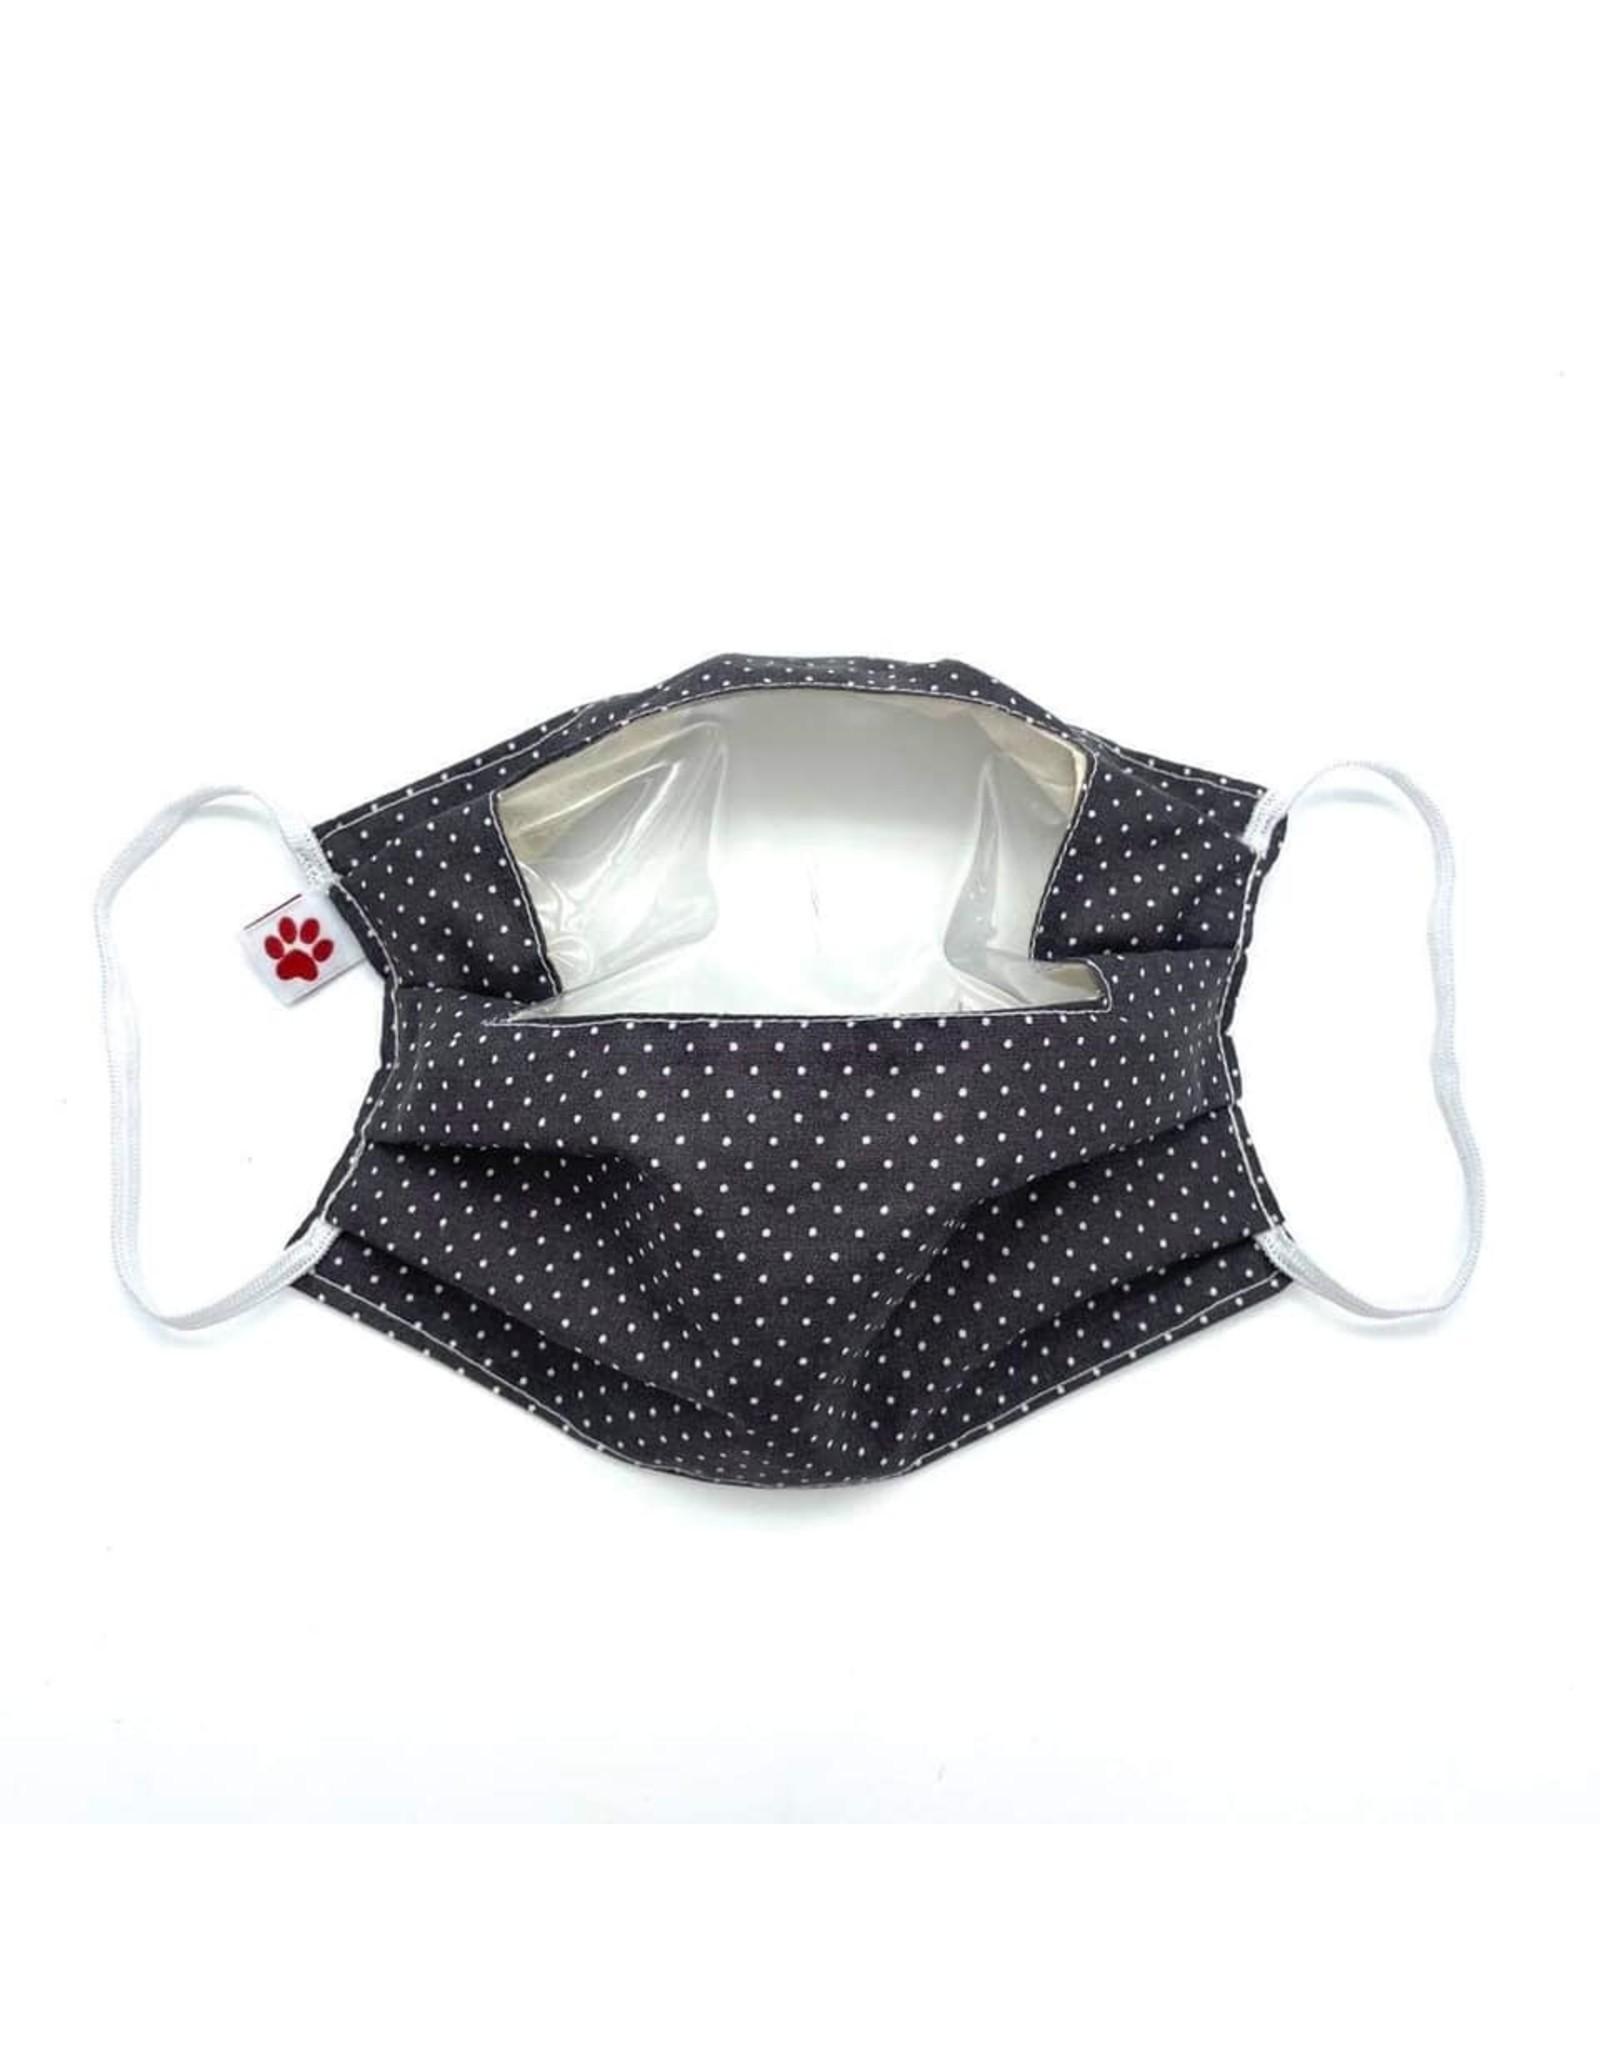 FLAX & STITCH masque de protection en polyester